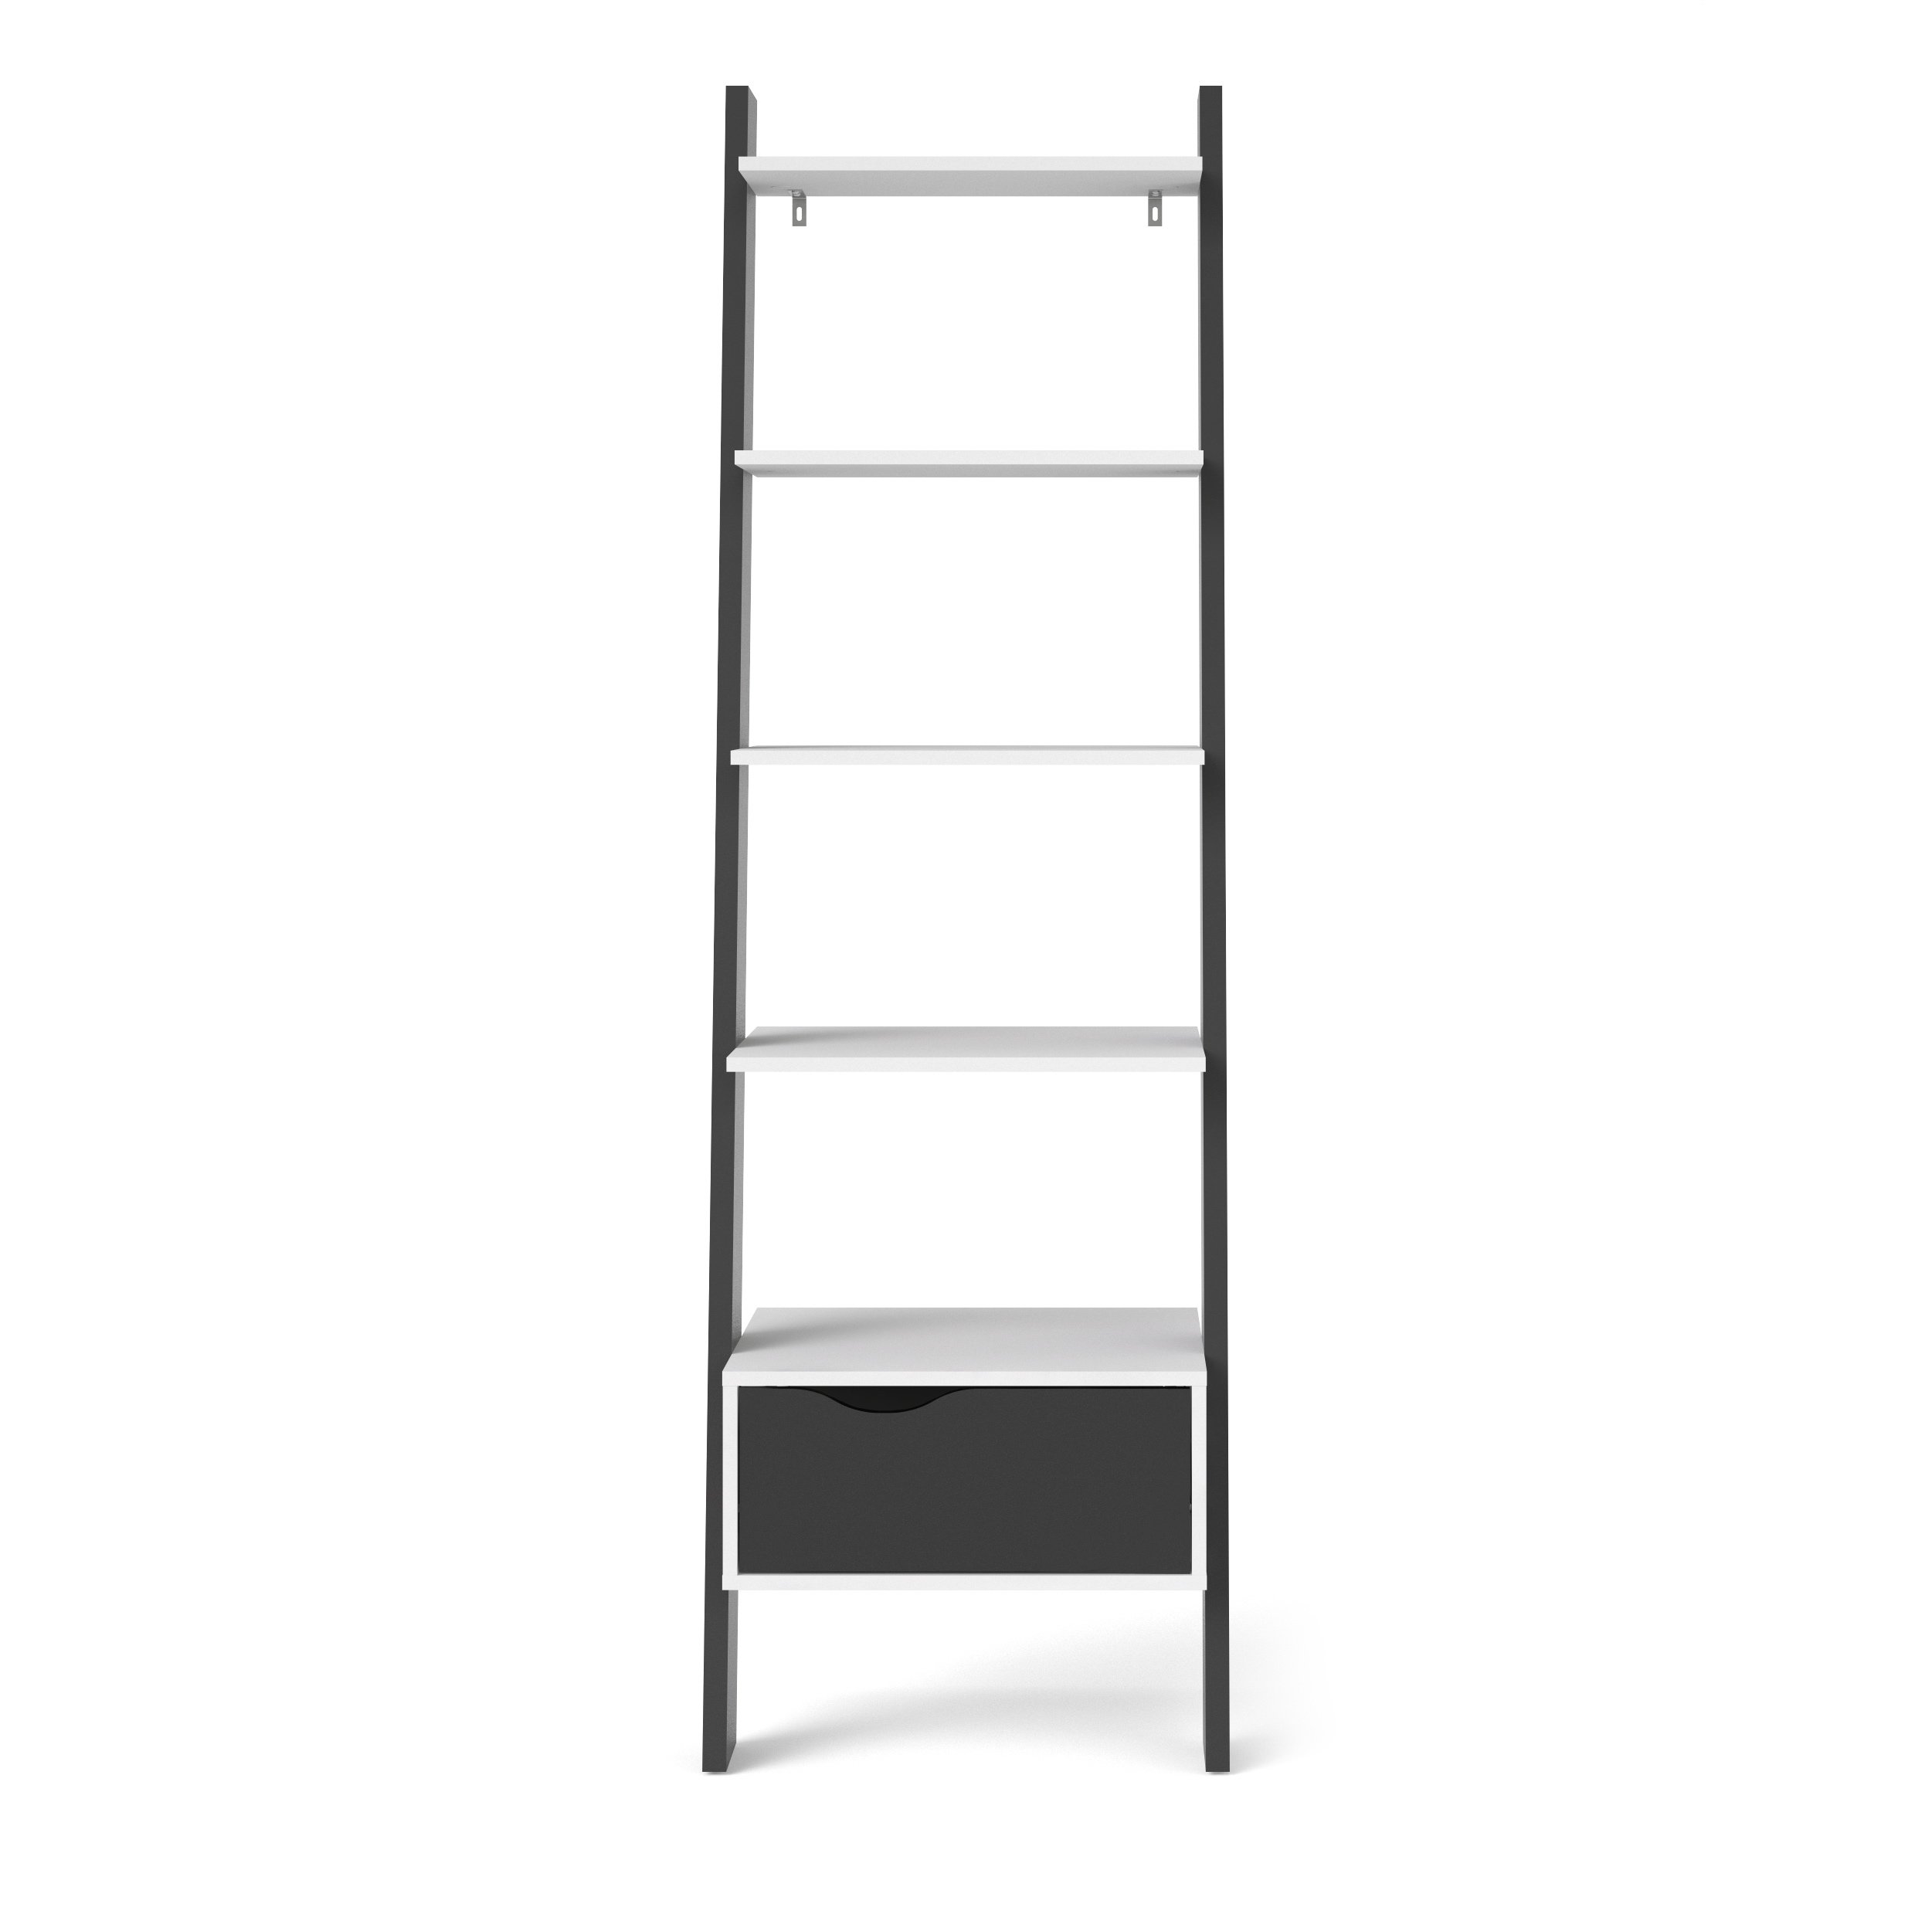 Tvilum 7538549gm Diana Bookcase with 1 Drawer, White/Black Matte